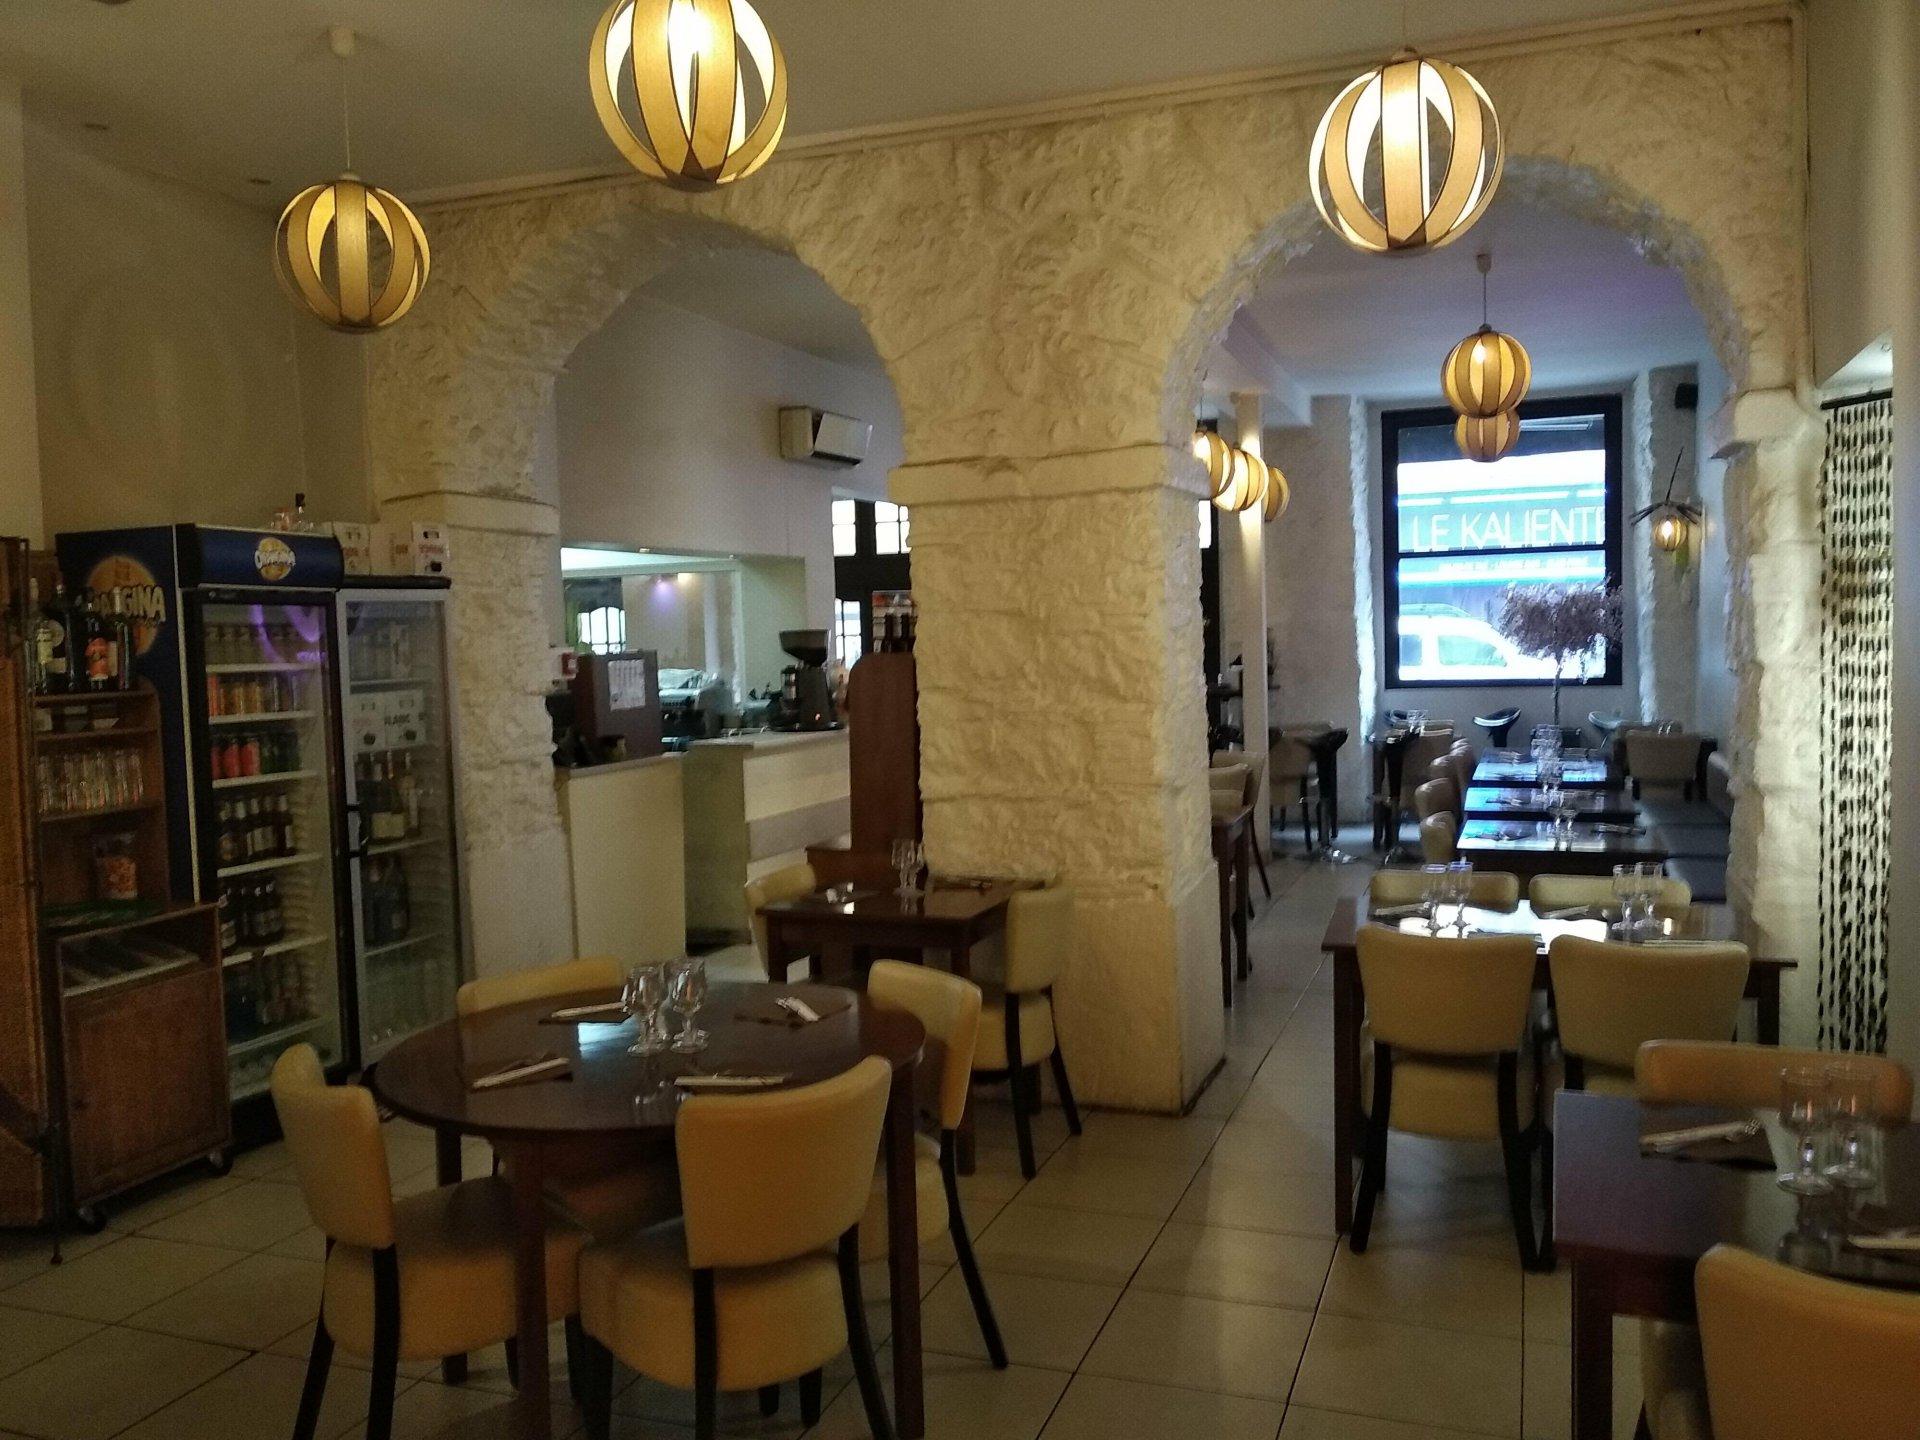 Restaurant, Place Garibaldi, Place du Pin